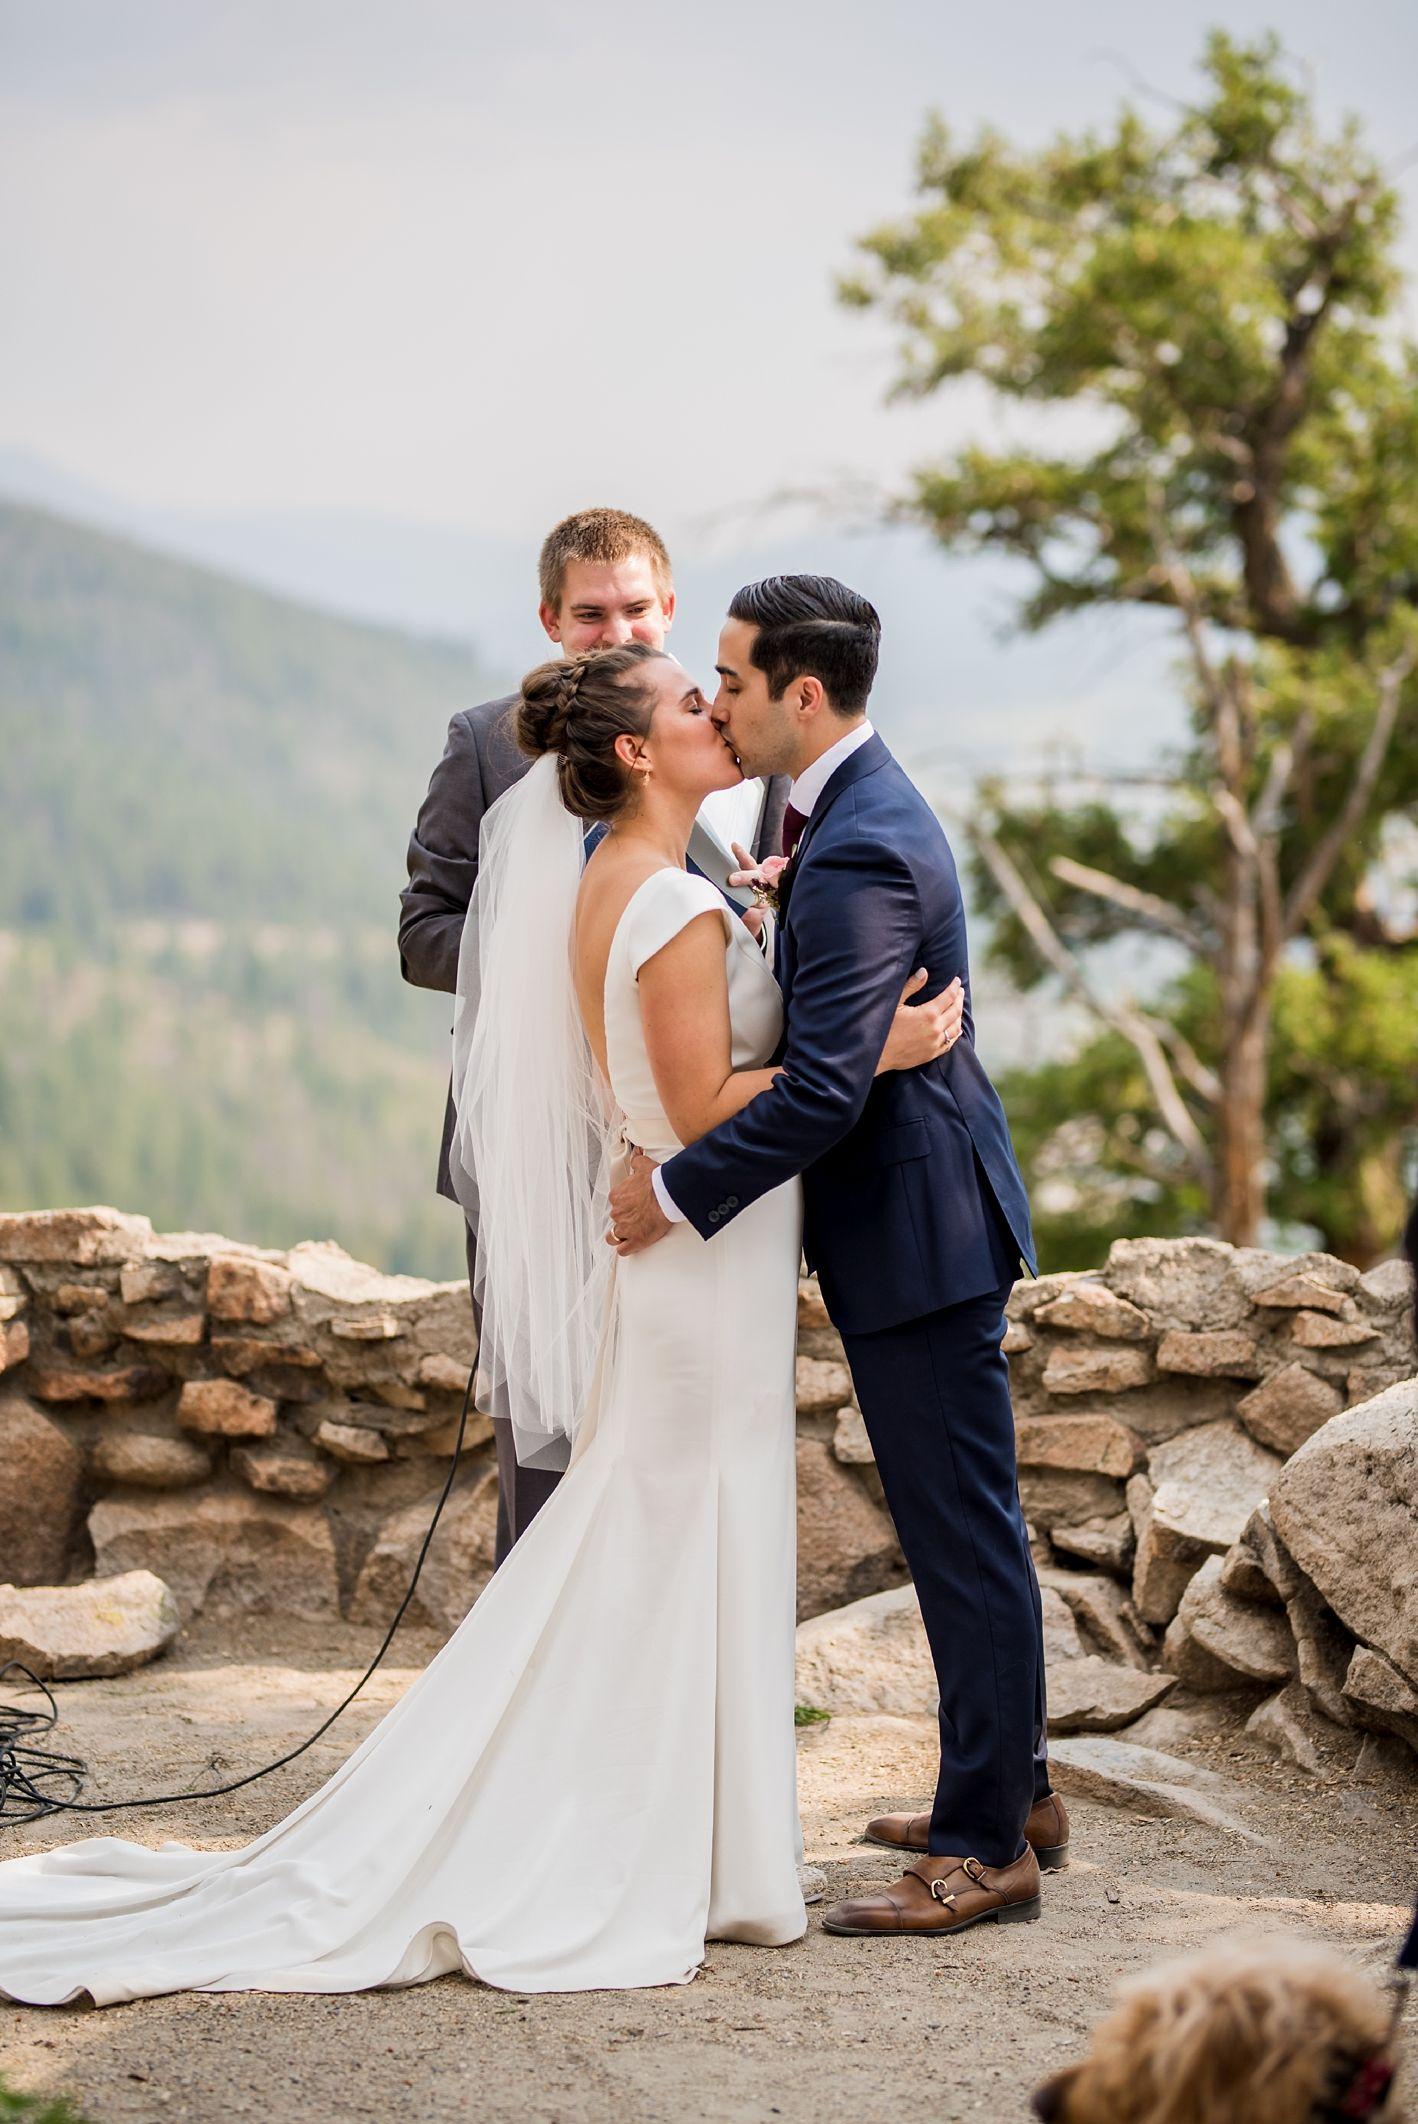 Emma & Jason Small intimate wedding, Colorado wedding